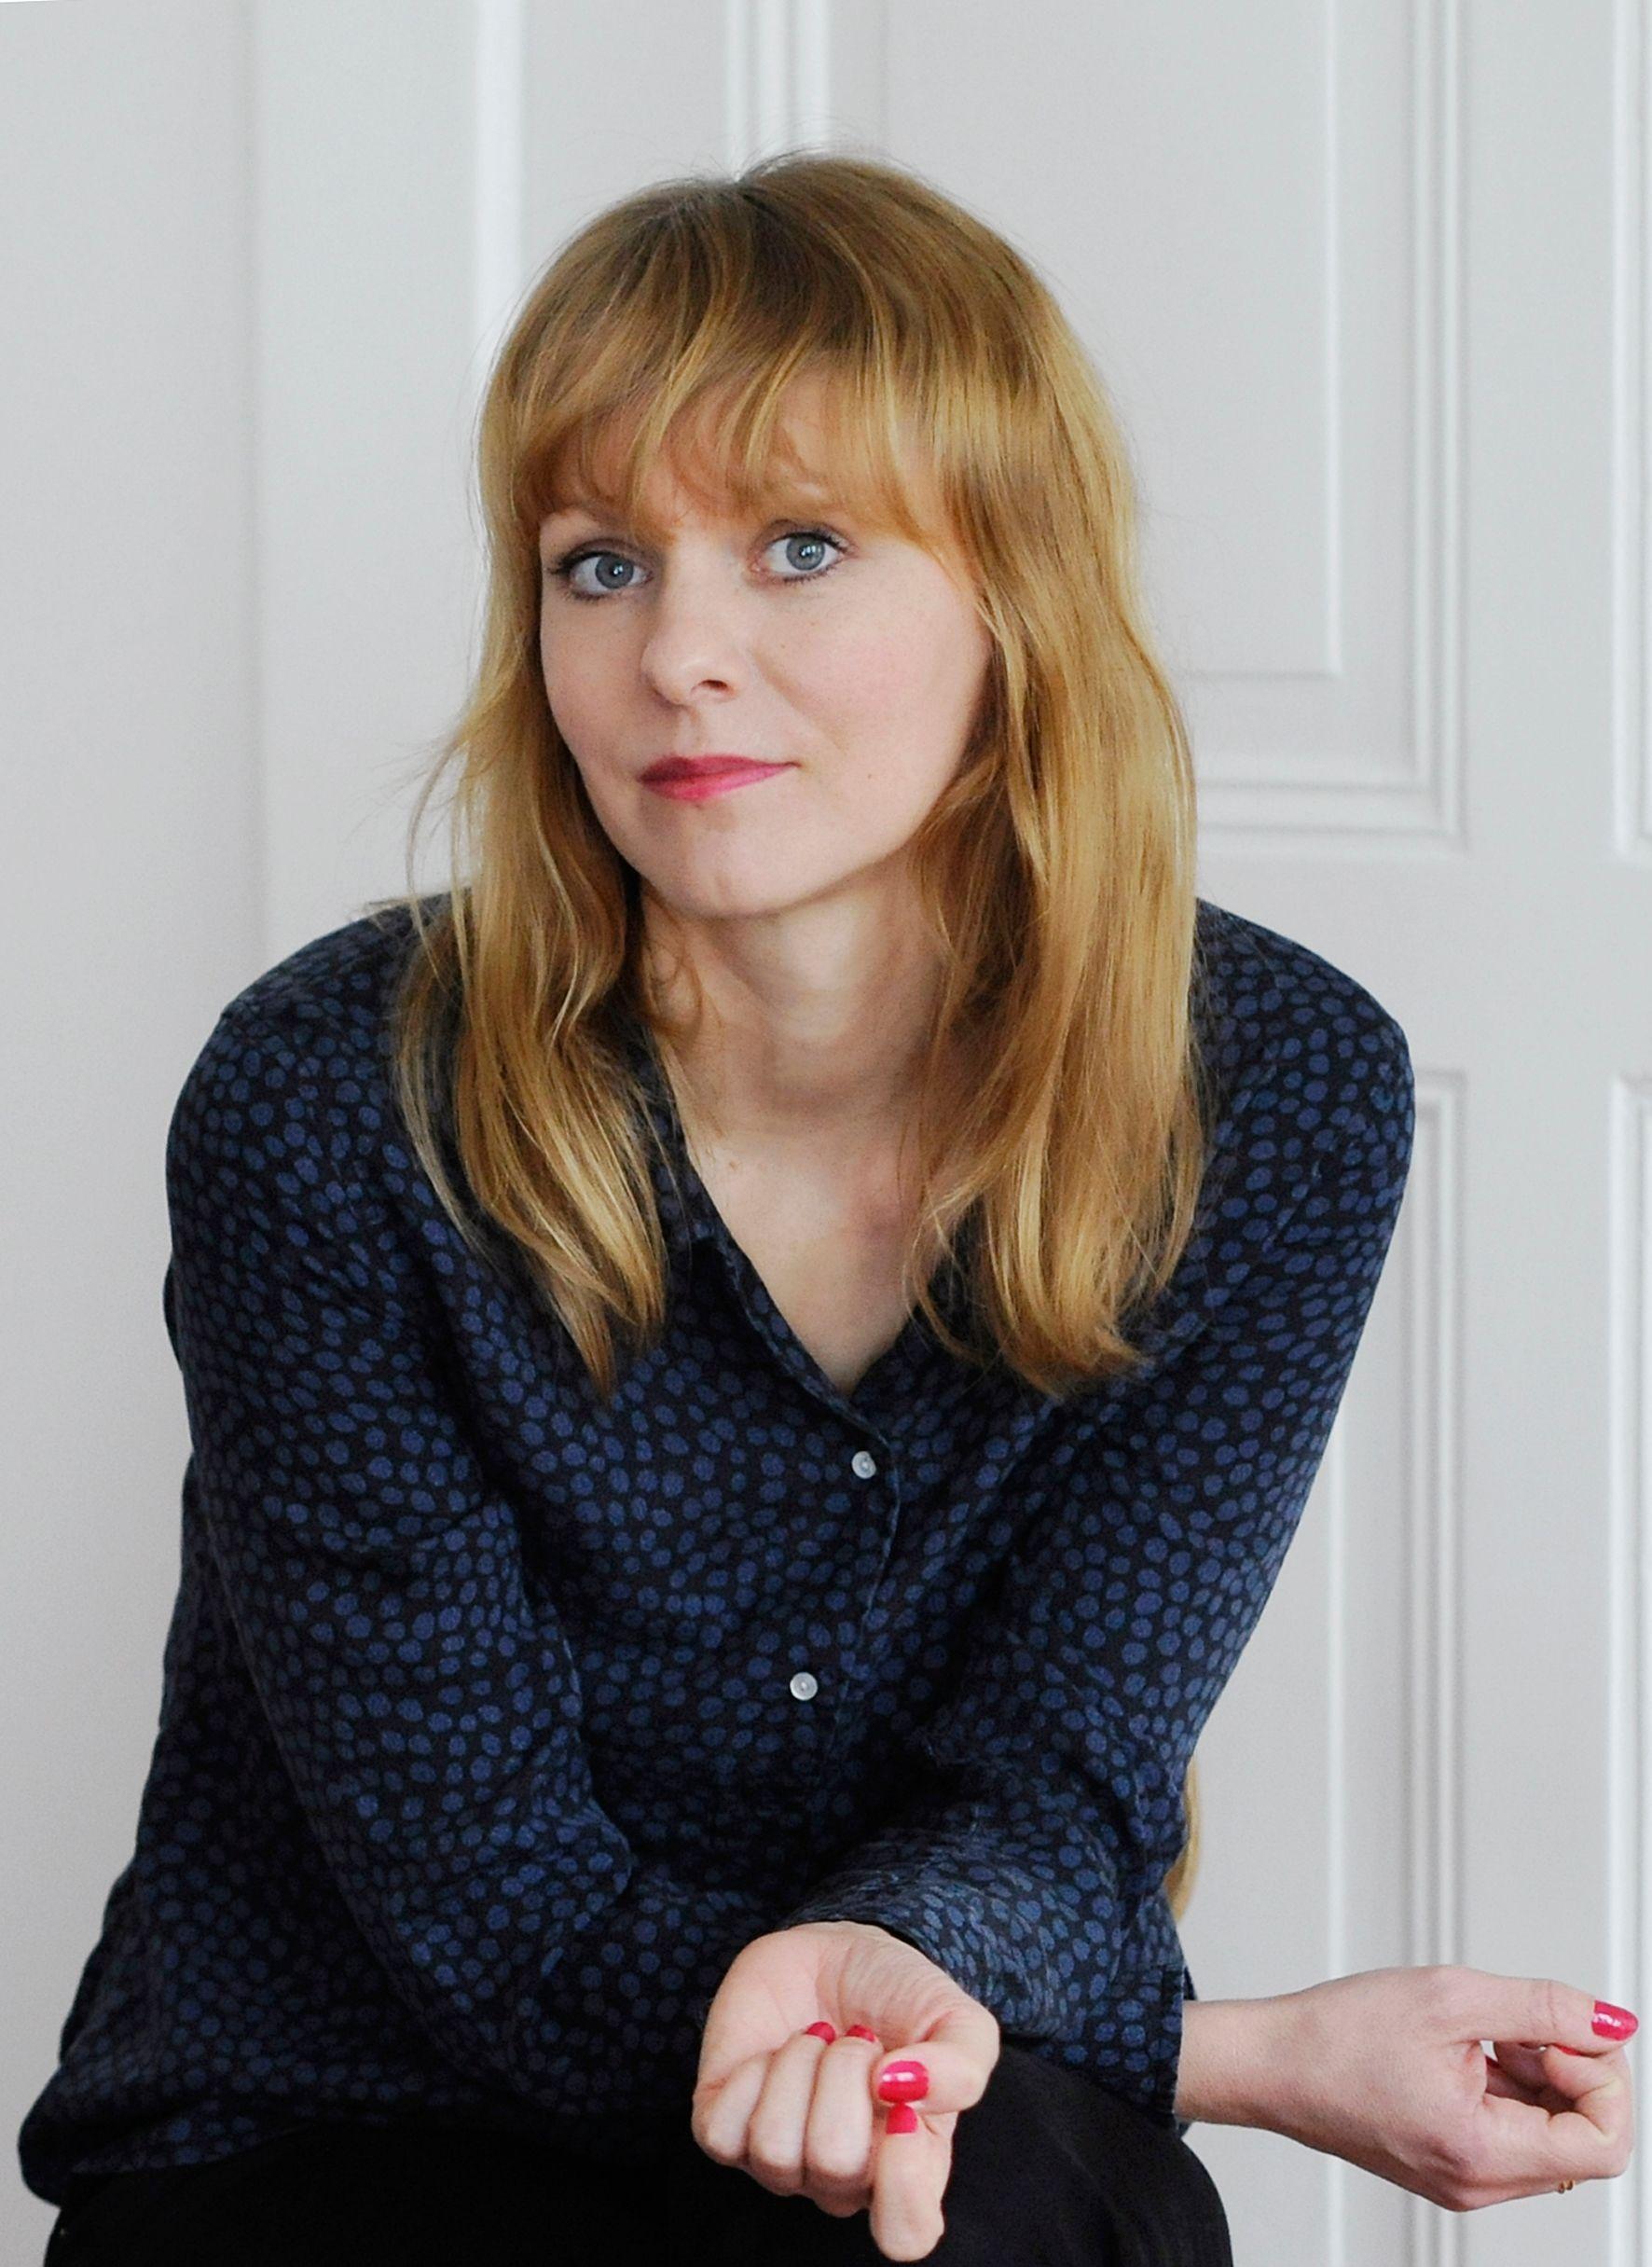 Toni Erdmann Director Maren Ade: Awards Spotlight [VIDEO